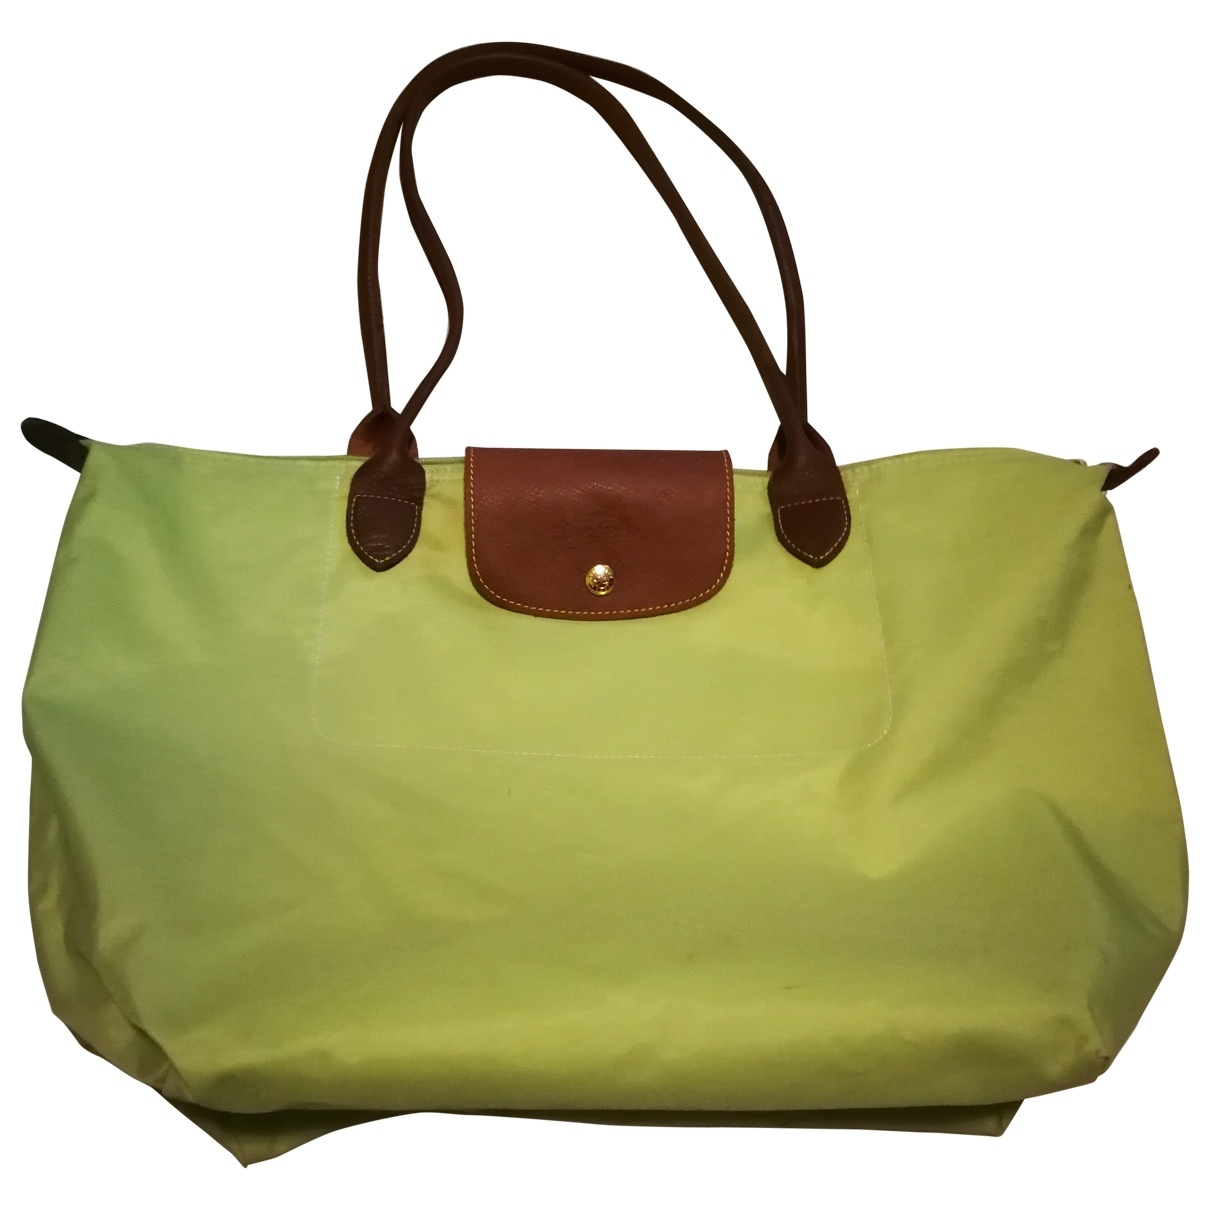 Longchamp - Sac a main   pour femme - vert